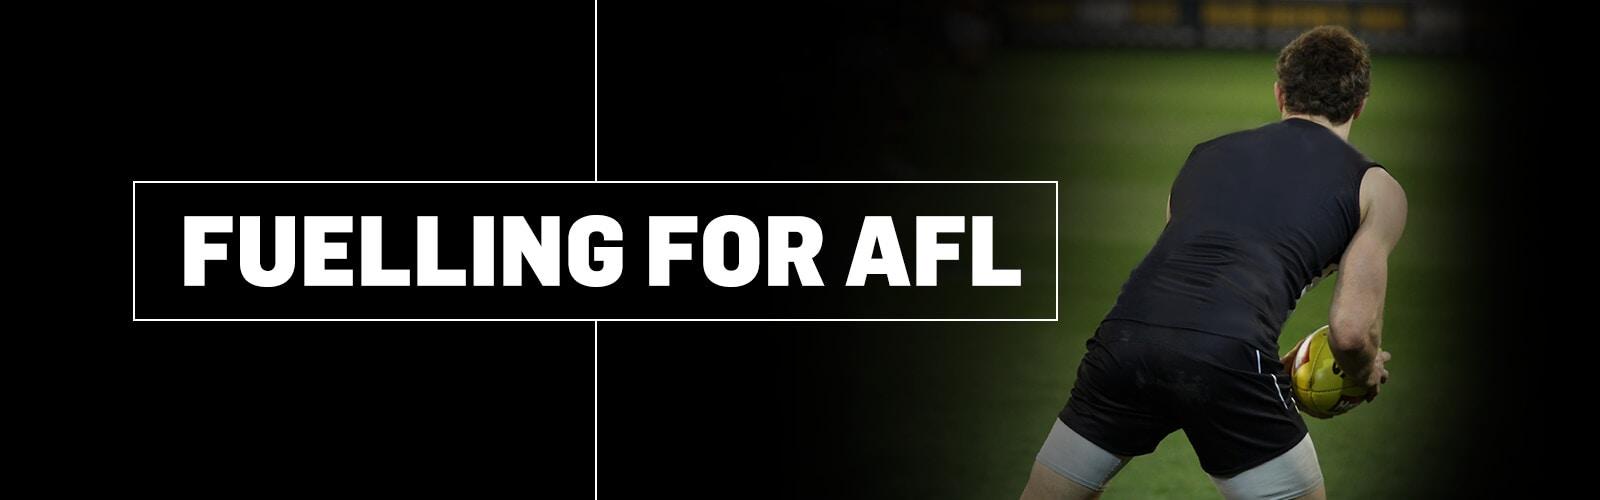 SIS - Fuelling for AFL